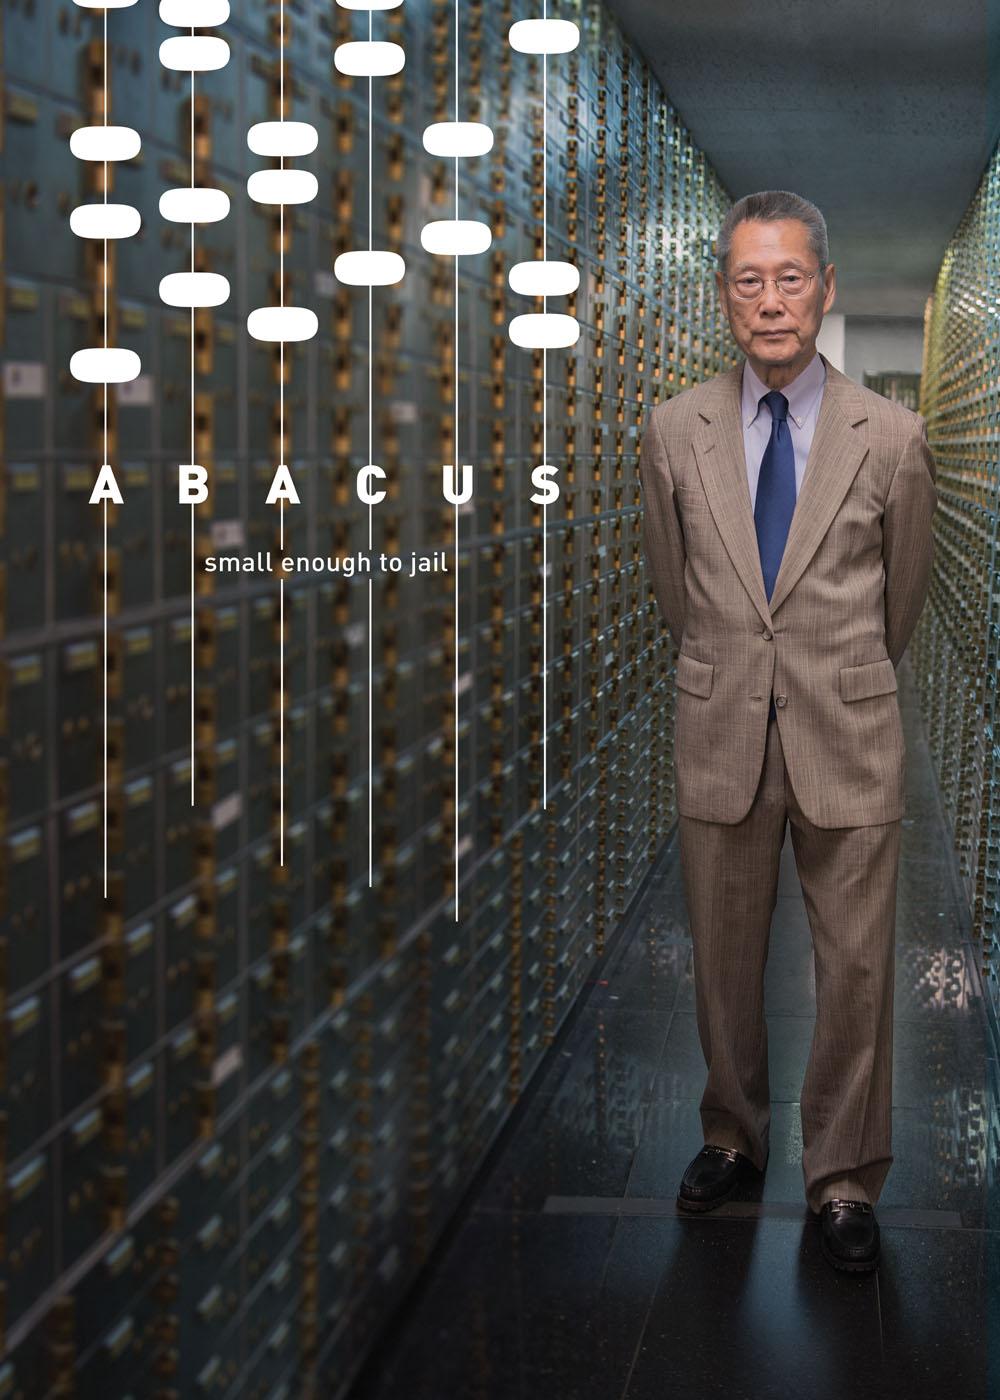 abacus_poster.jpg